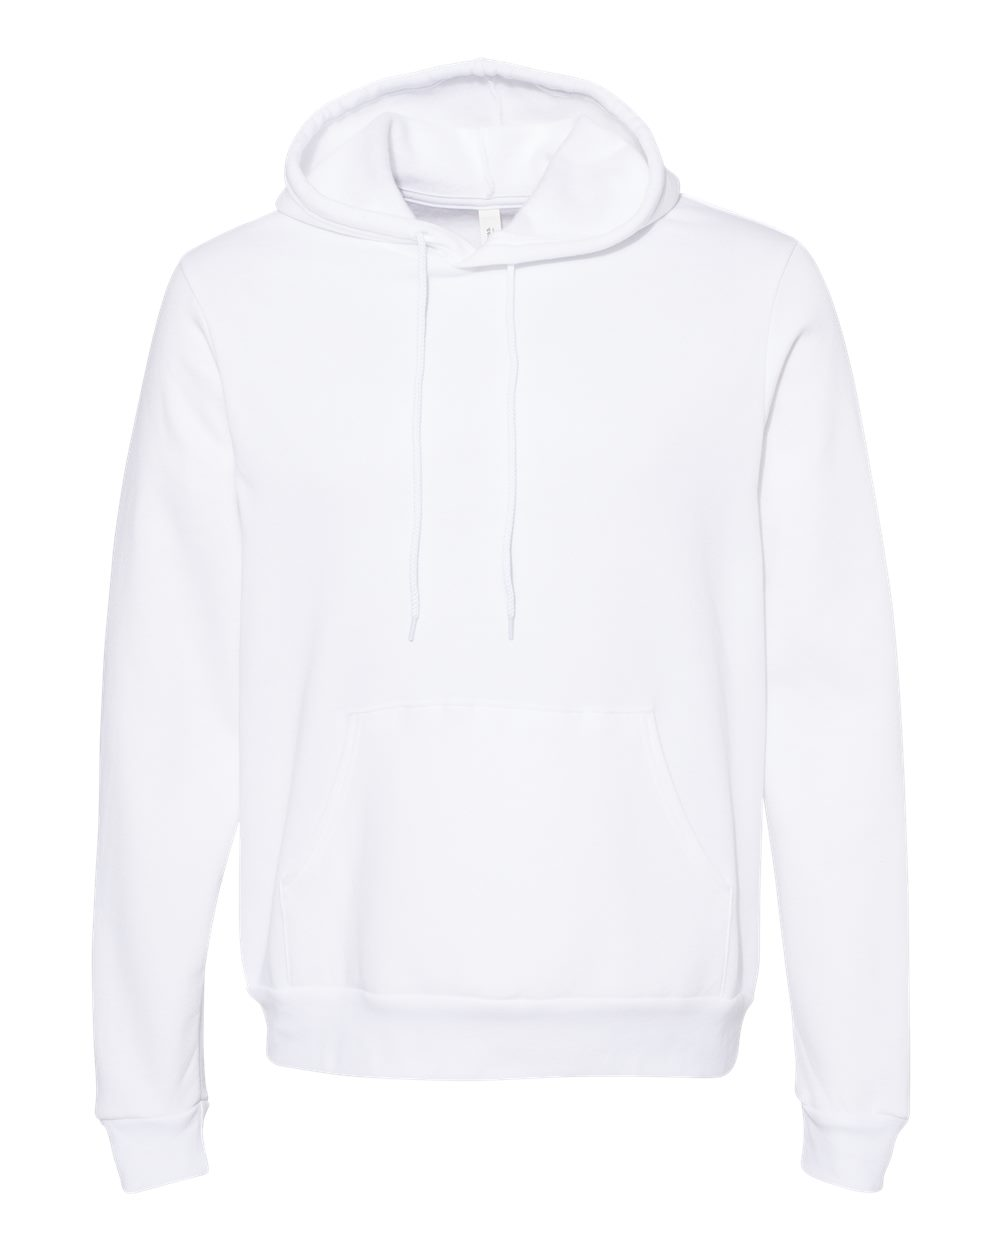 Bella-Canvas-Unisex-Sponge-Hooded-Pullover-Sweatshirt-Blank-3719-up-to-2XL thumbnail 34